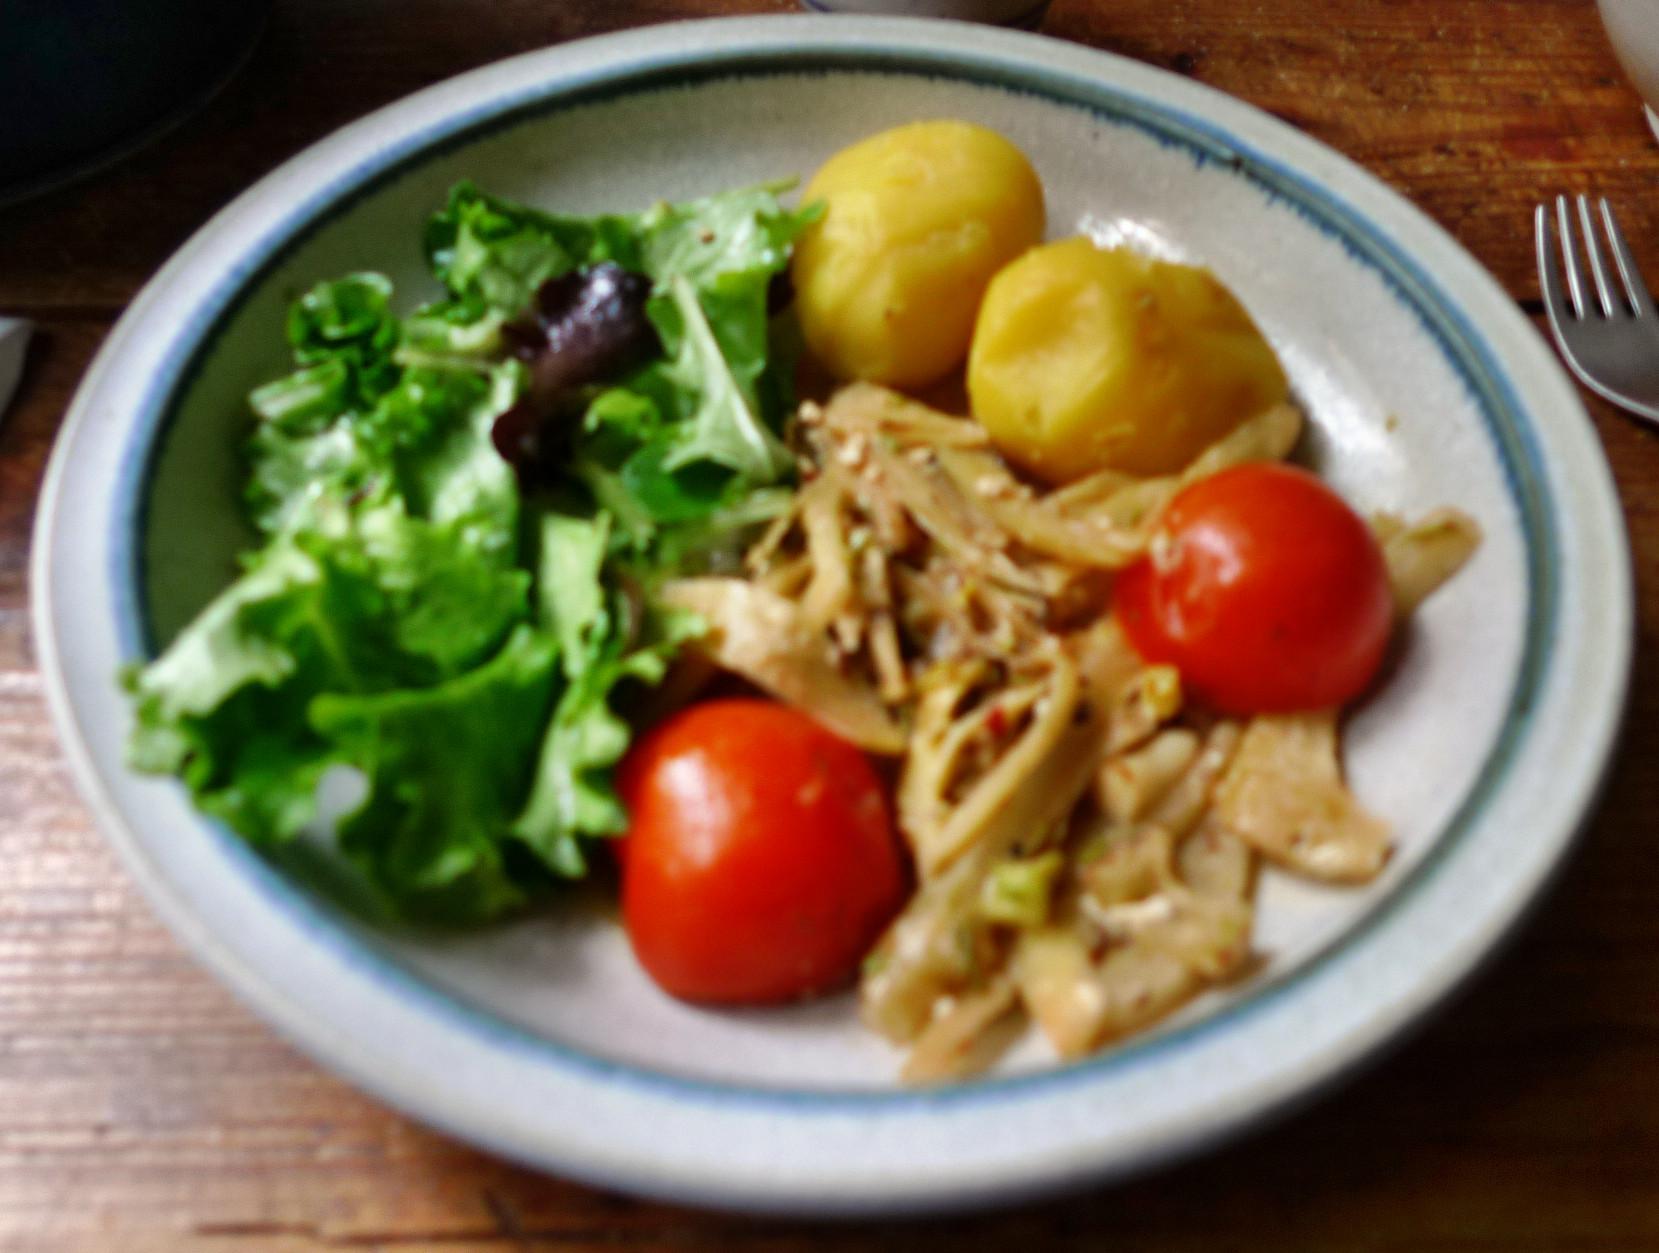 Fenchelgemüse,Kartoffeln,Salat -8..15   (12)